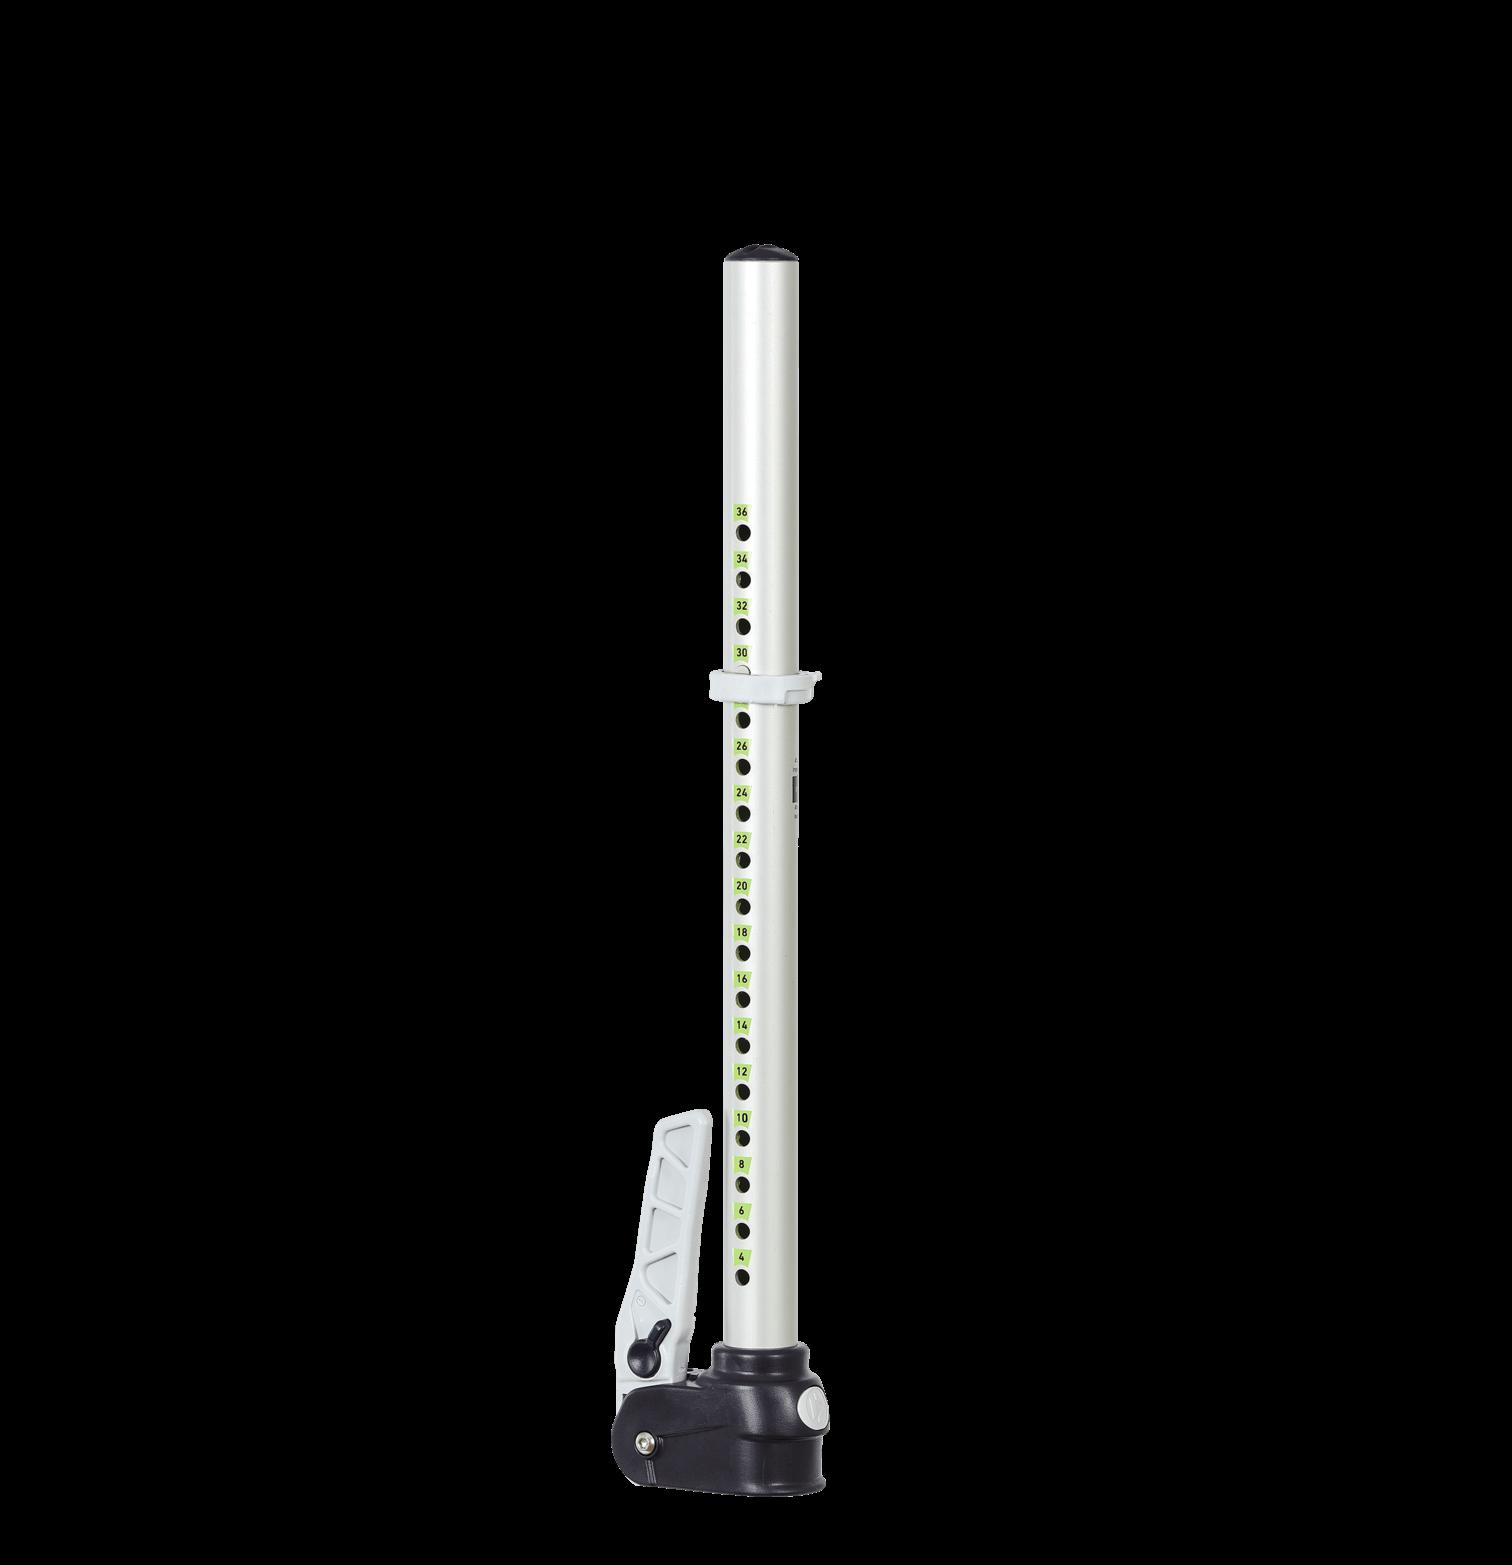 DuoTone EPX XT RDM Mast Extension